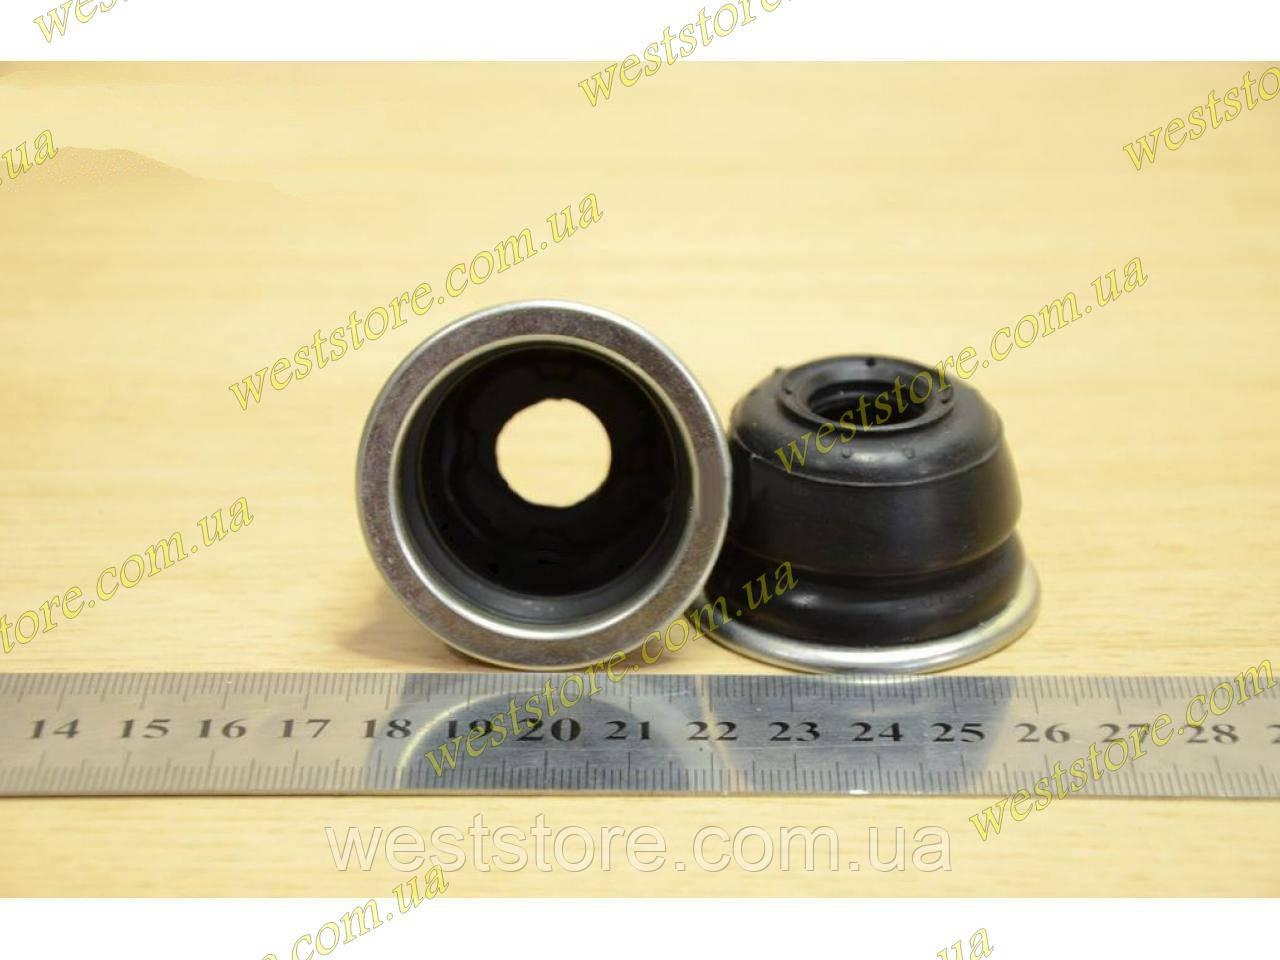 Пыльник рулевого наконечника тяги ваз 2101 2102 2103 2104 2105 2106 2107 БРТ завод